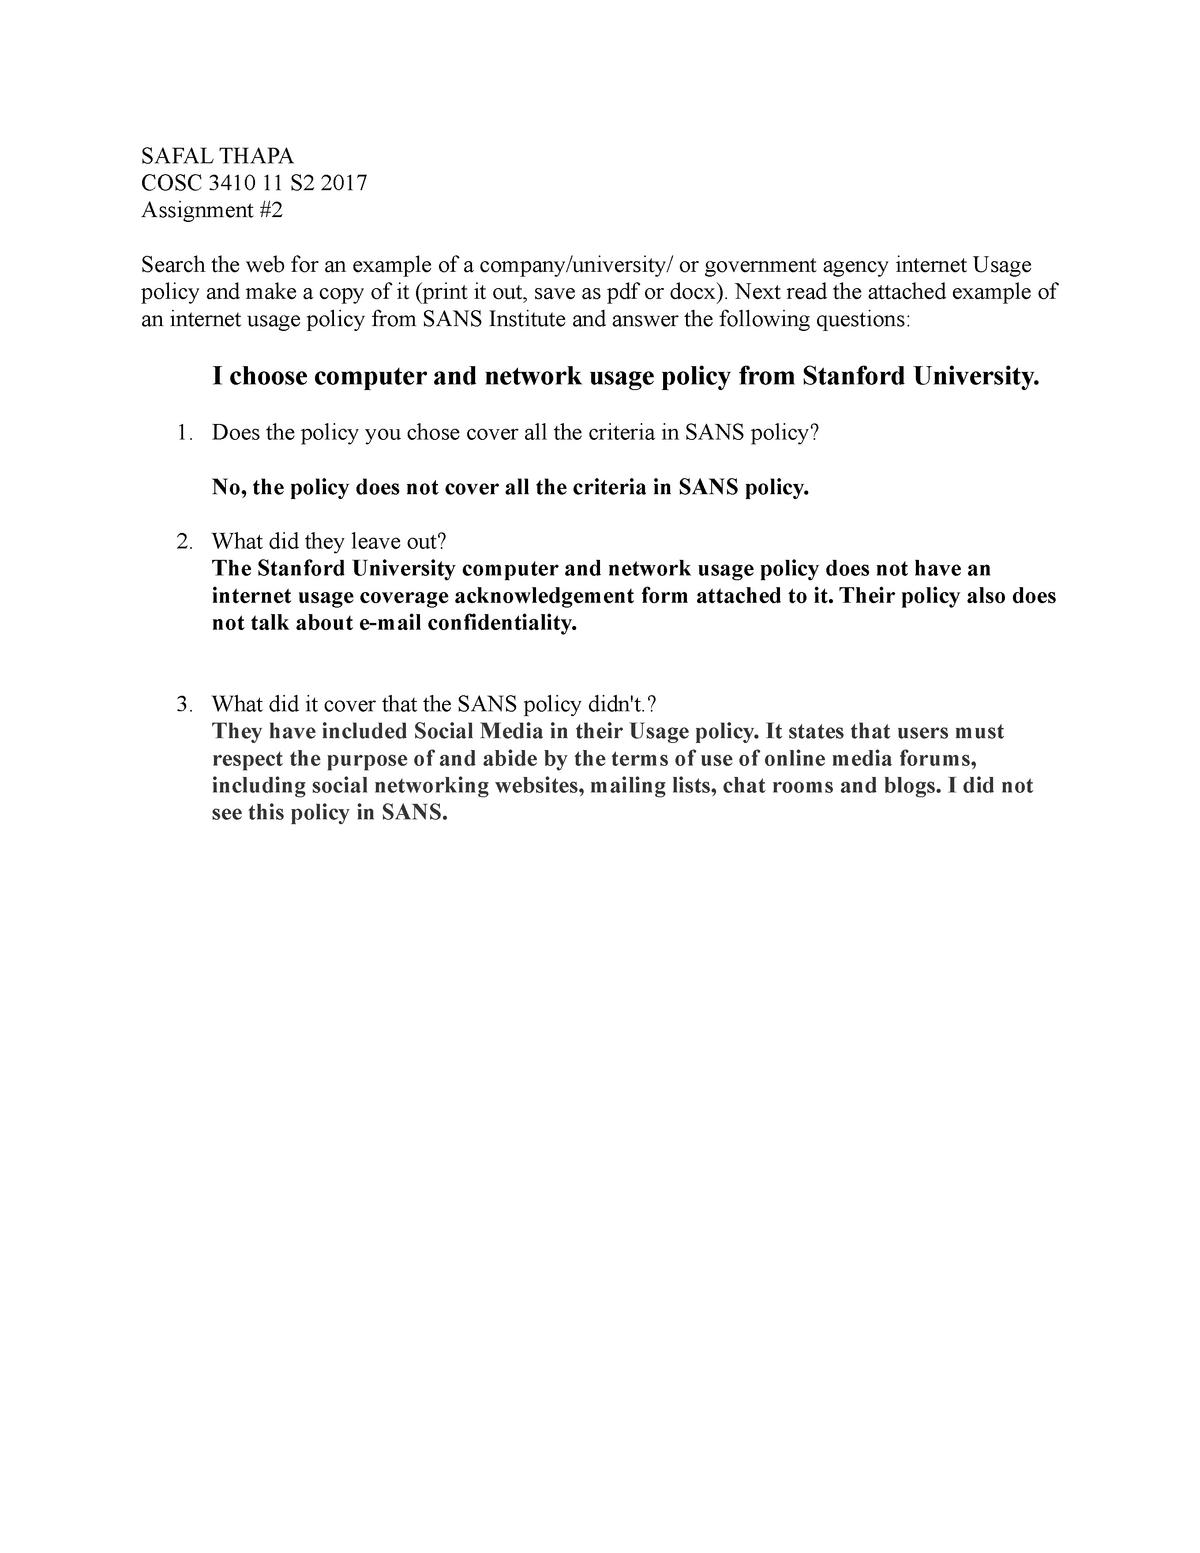 Assignment #2 - COSC 3410: Computer Security - StuDocu